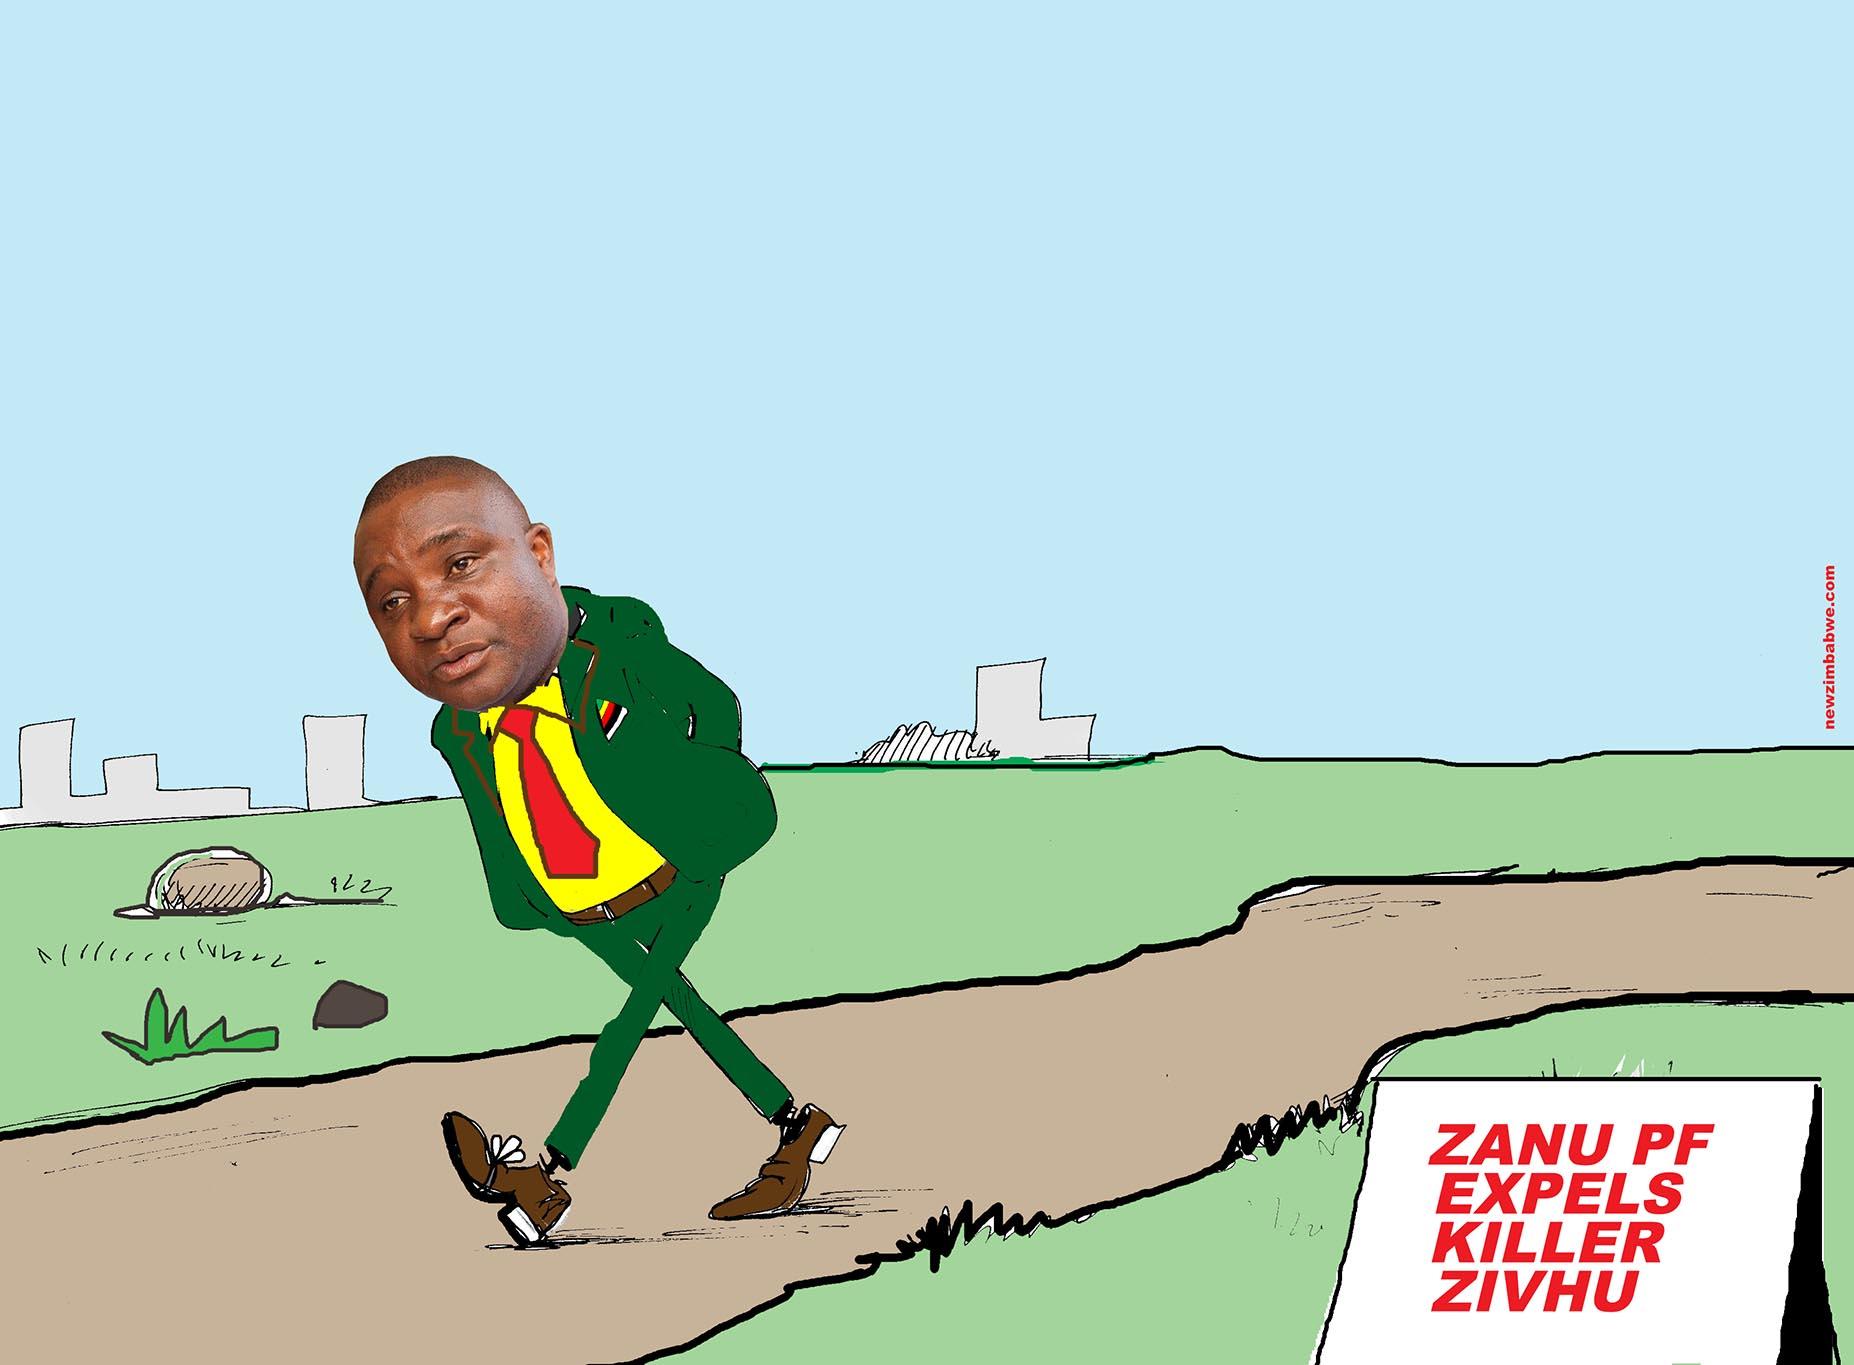 Zanu PF expels Zivhu